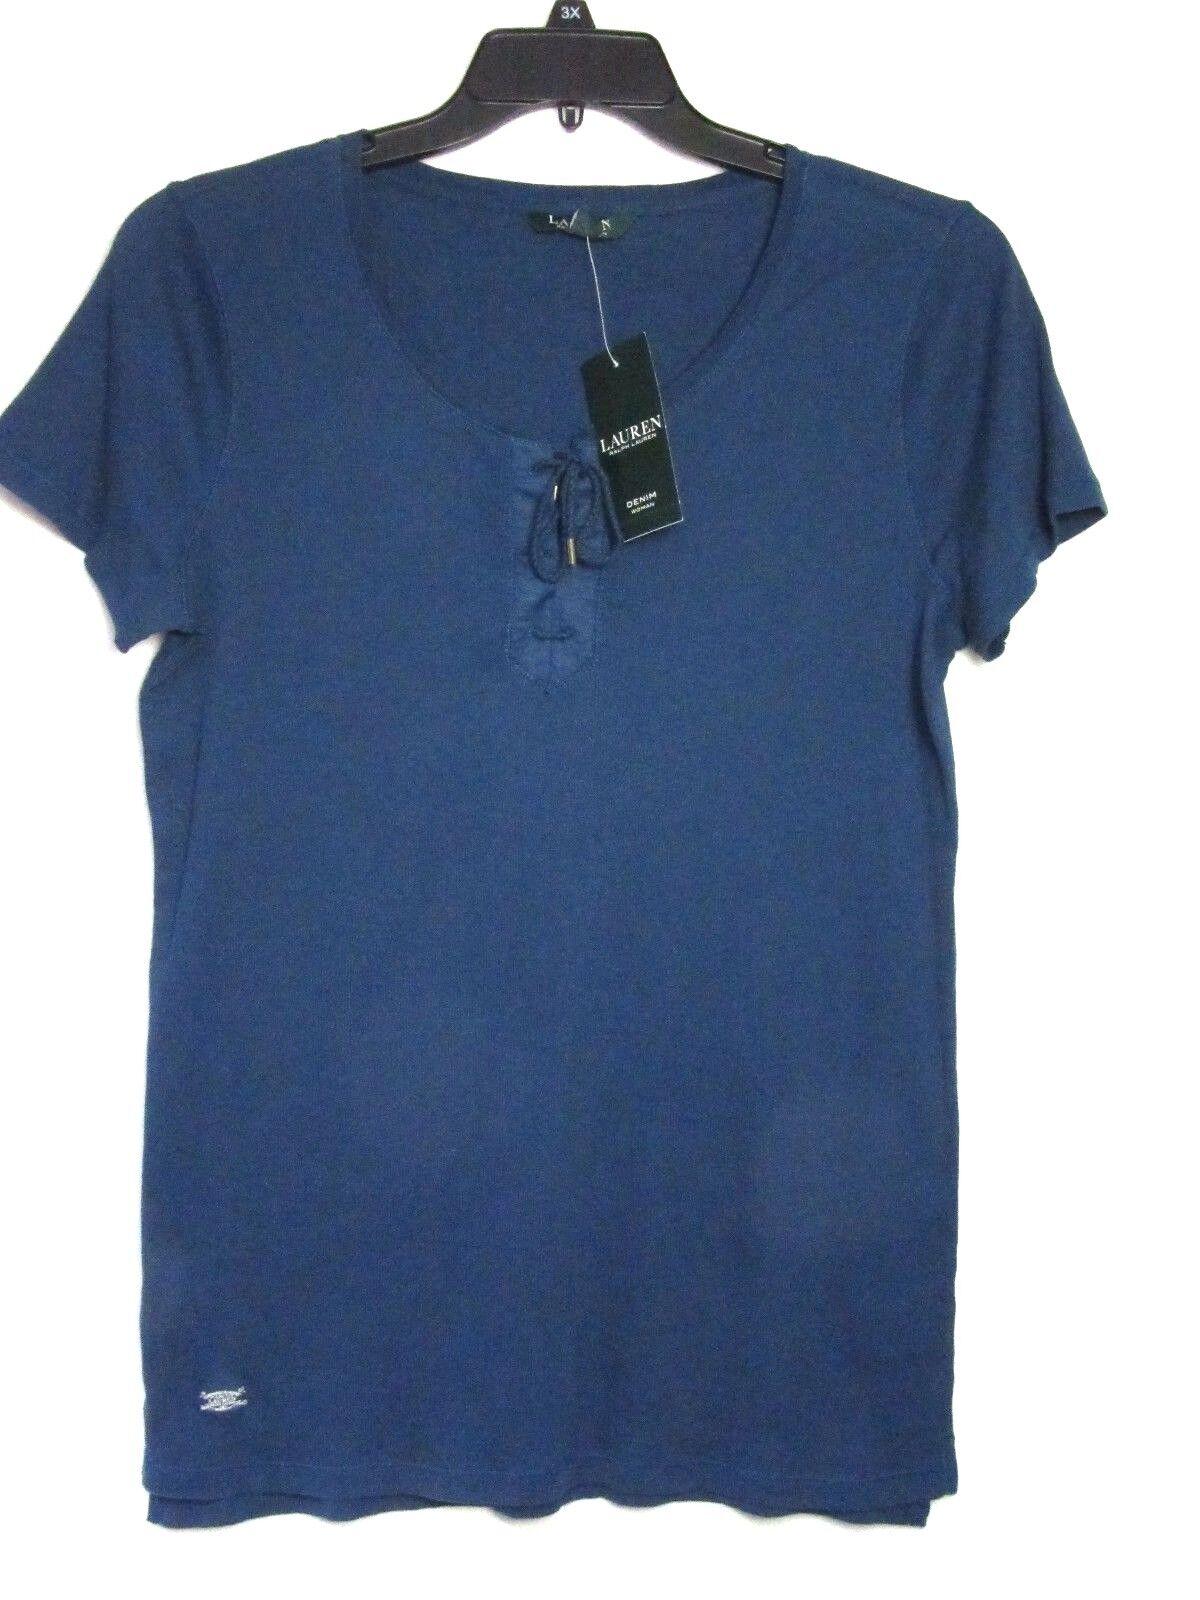 NWT Ralph Lauren Denim 1X Lt. Indigo bluee Knit Top Tee Tie Front NEW Cat Rescue